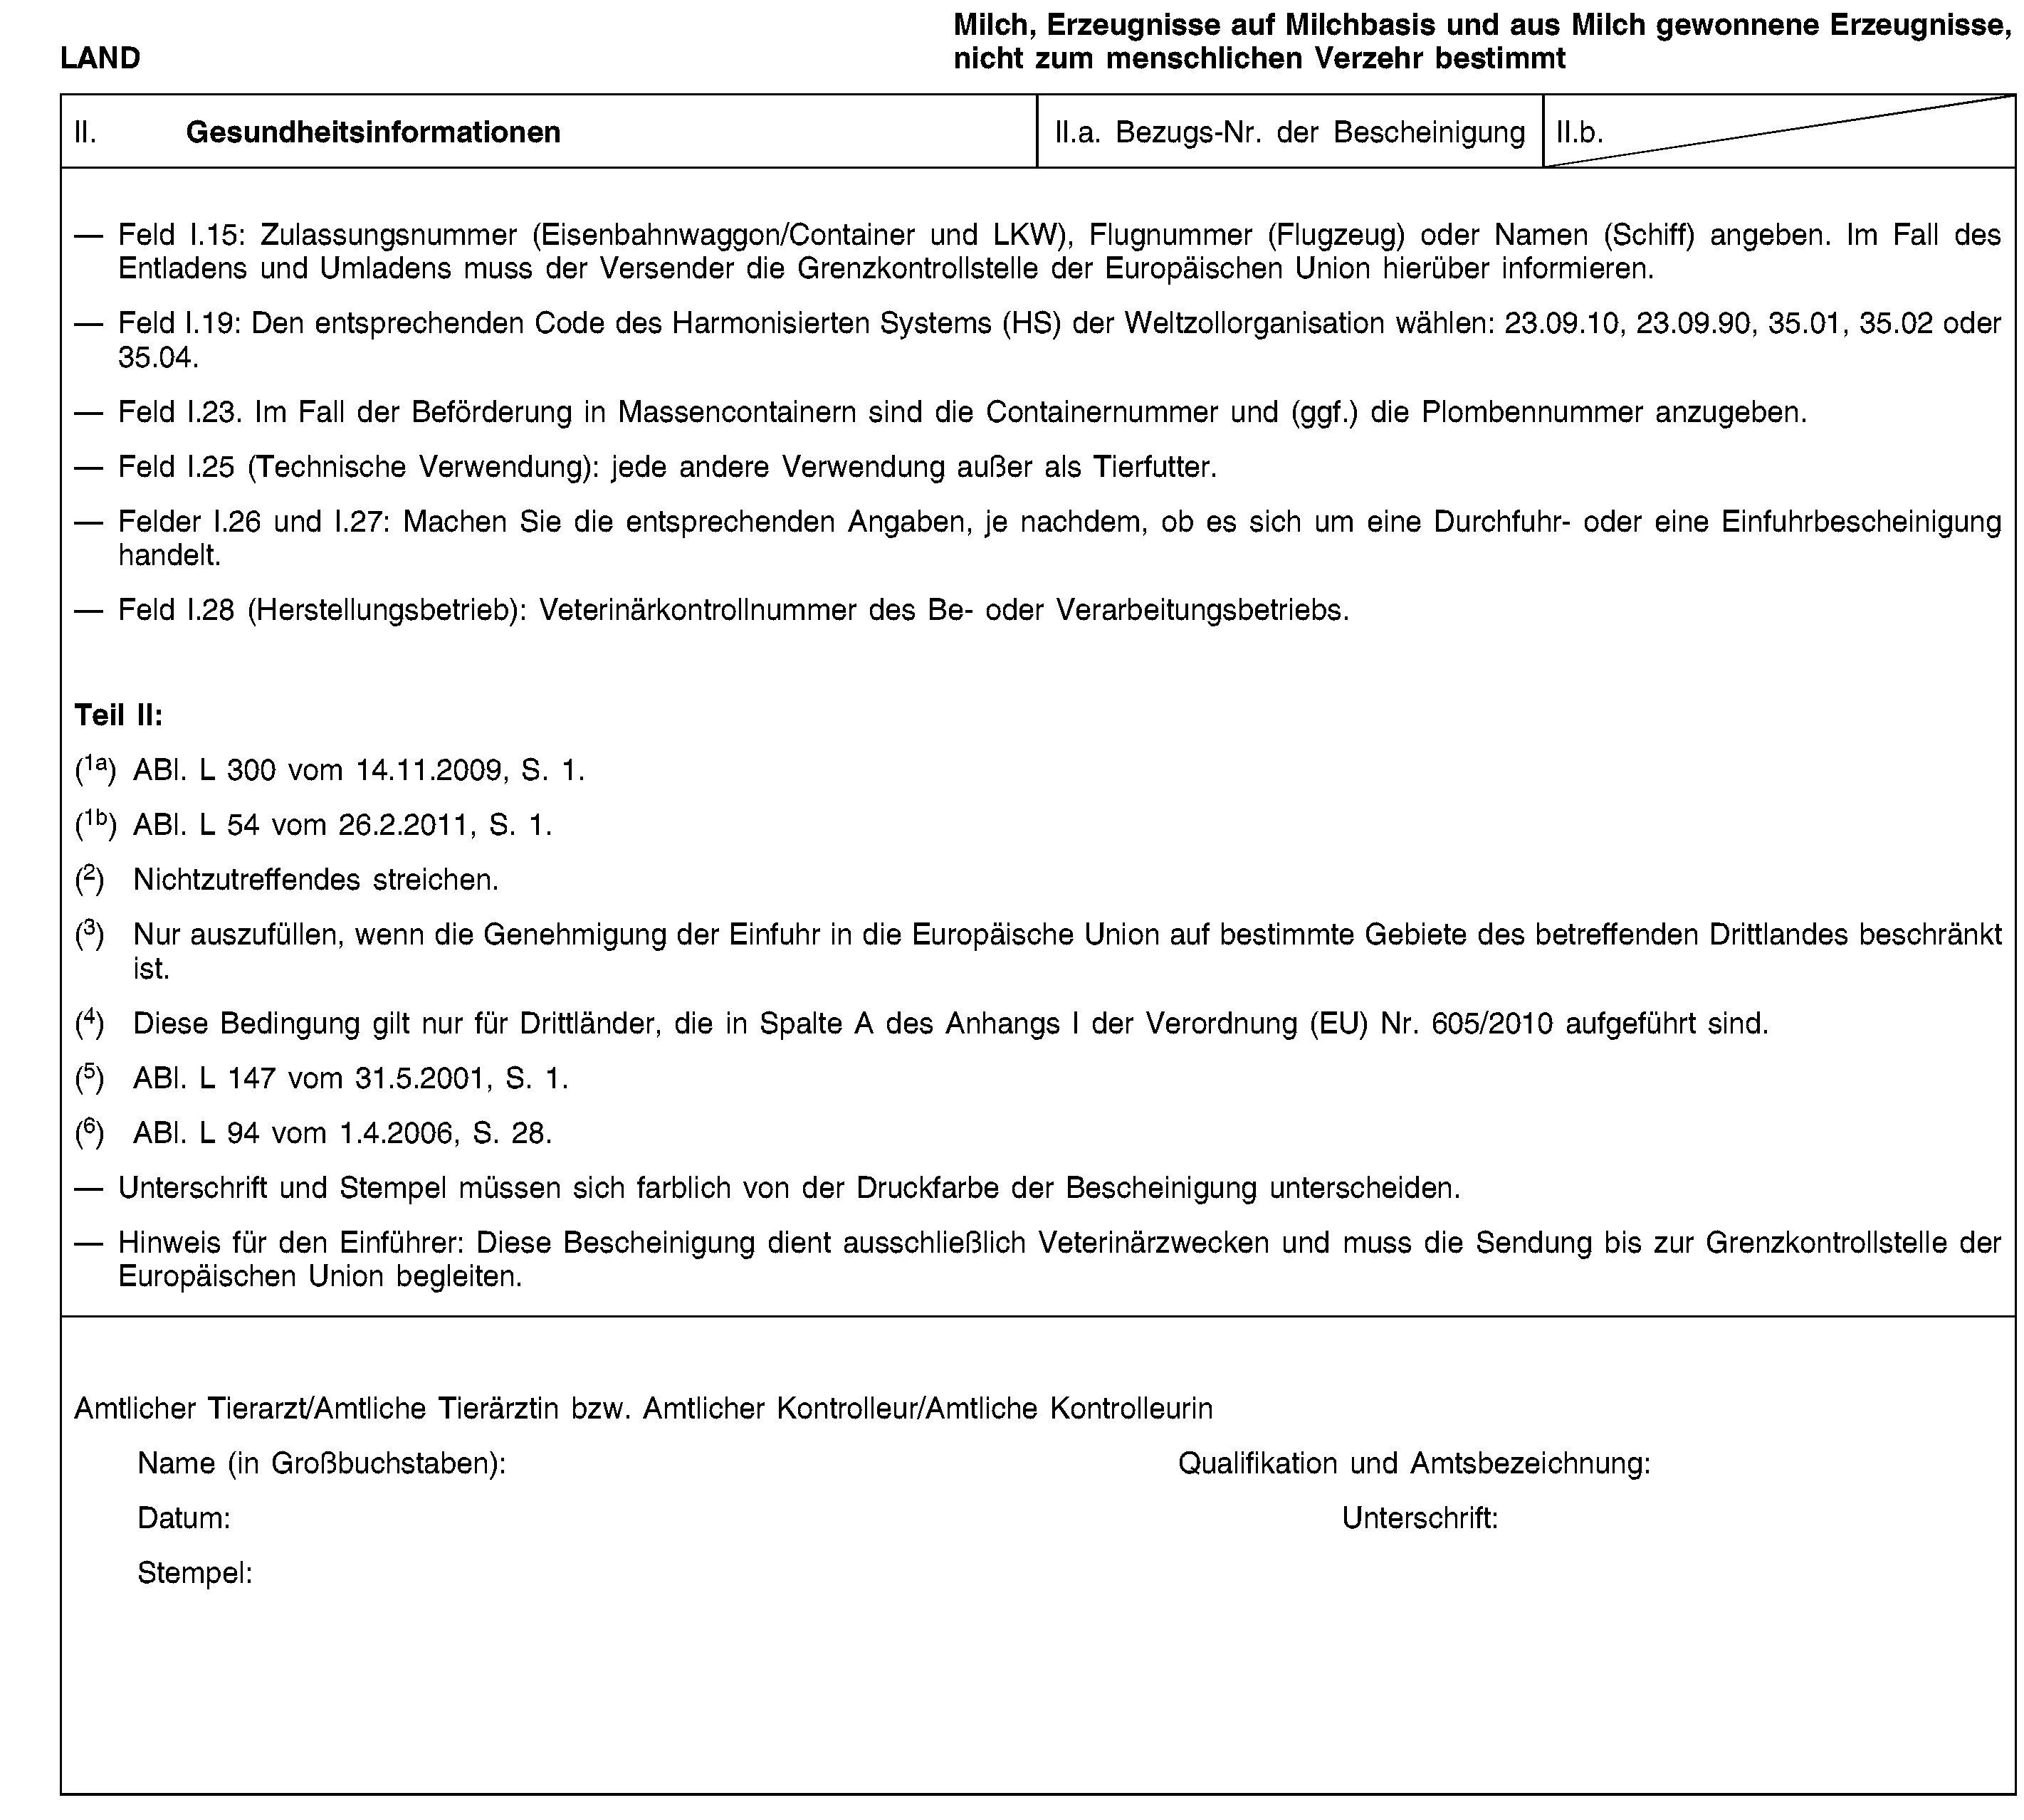 EUR-Lex - 02011R0142-20170529 - EN - EUR-Lex